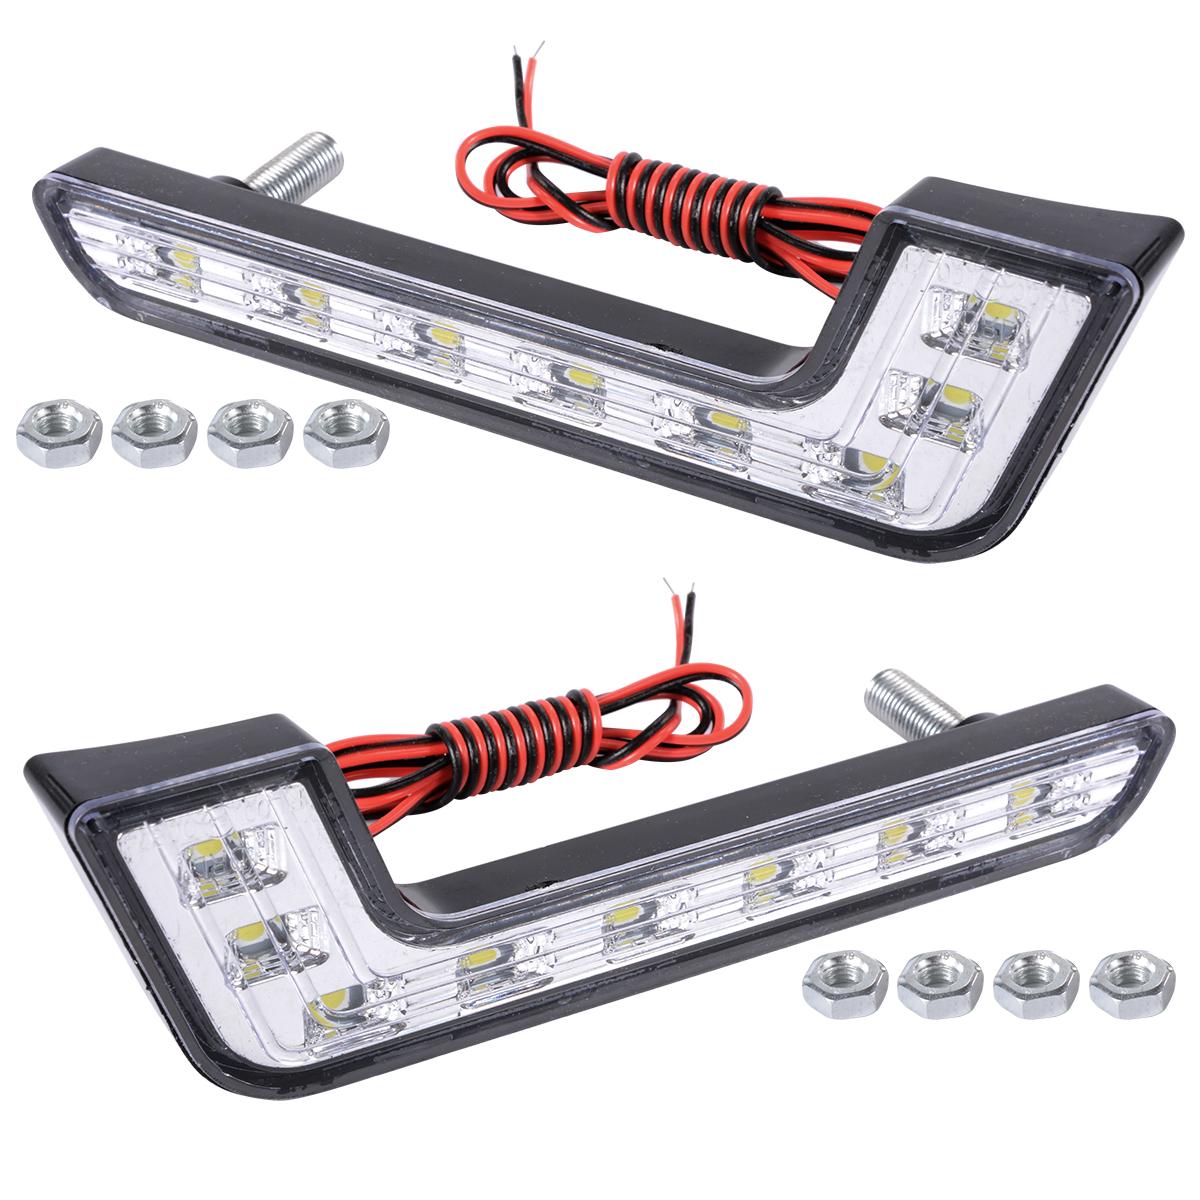 2x 6000k Car Daytime Running DRL Bright Driving Day Light Head Lamp 8 LED white MA145(China (Mainland))